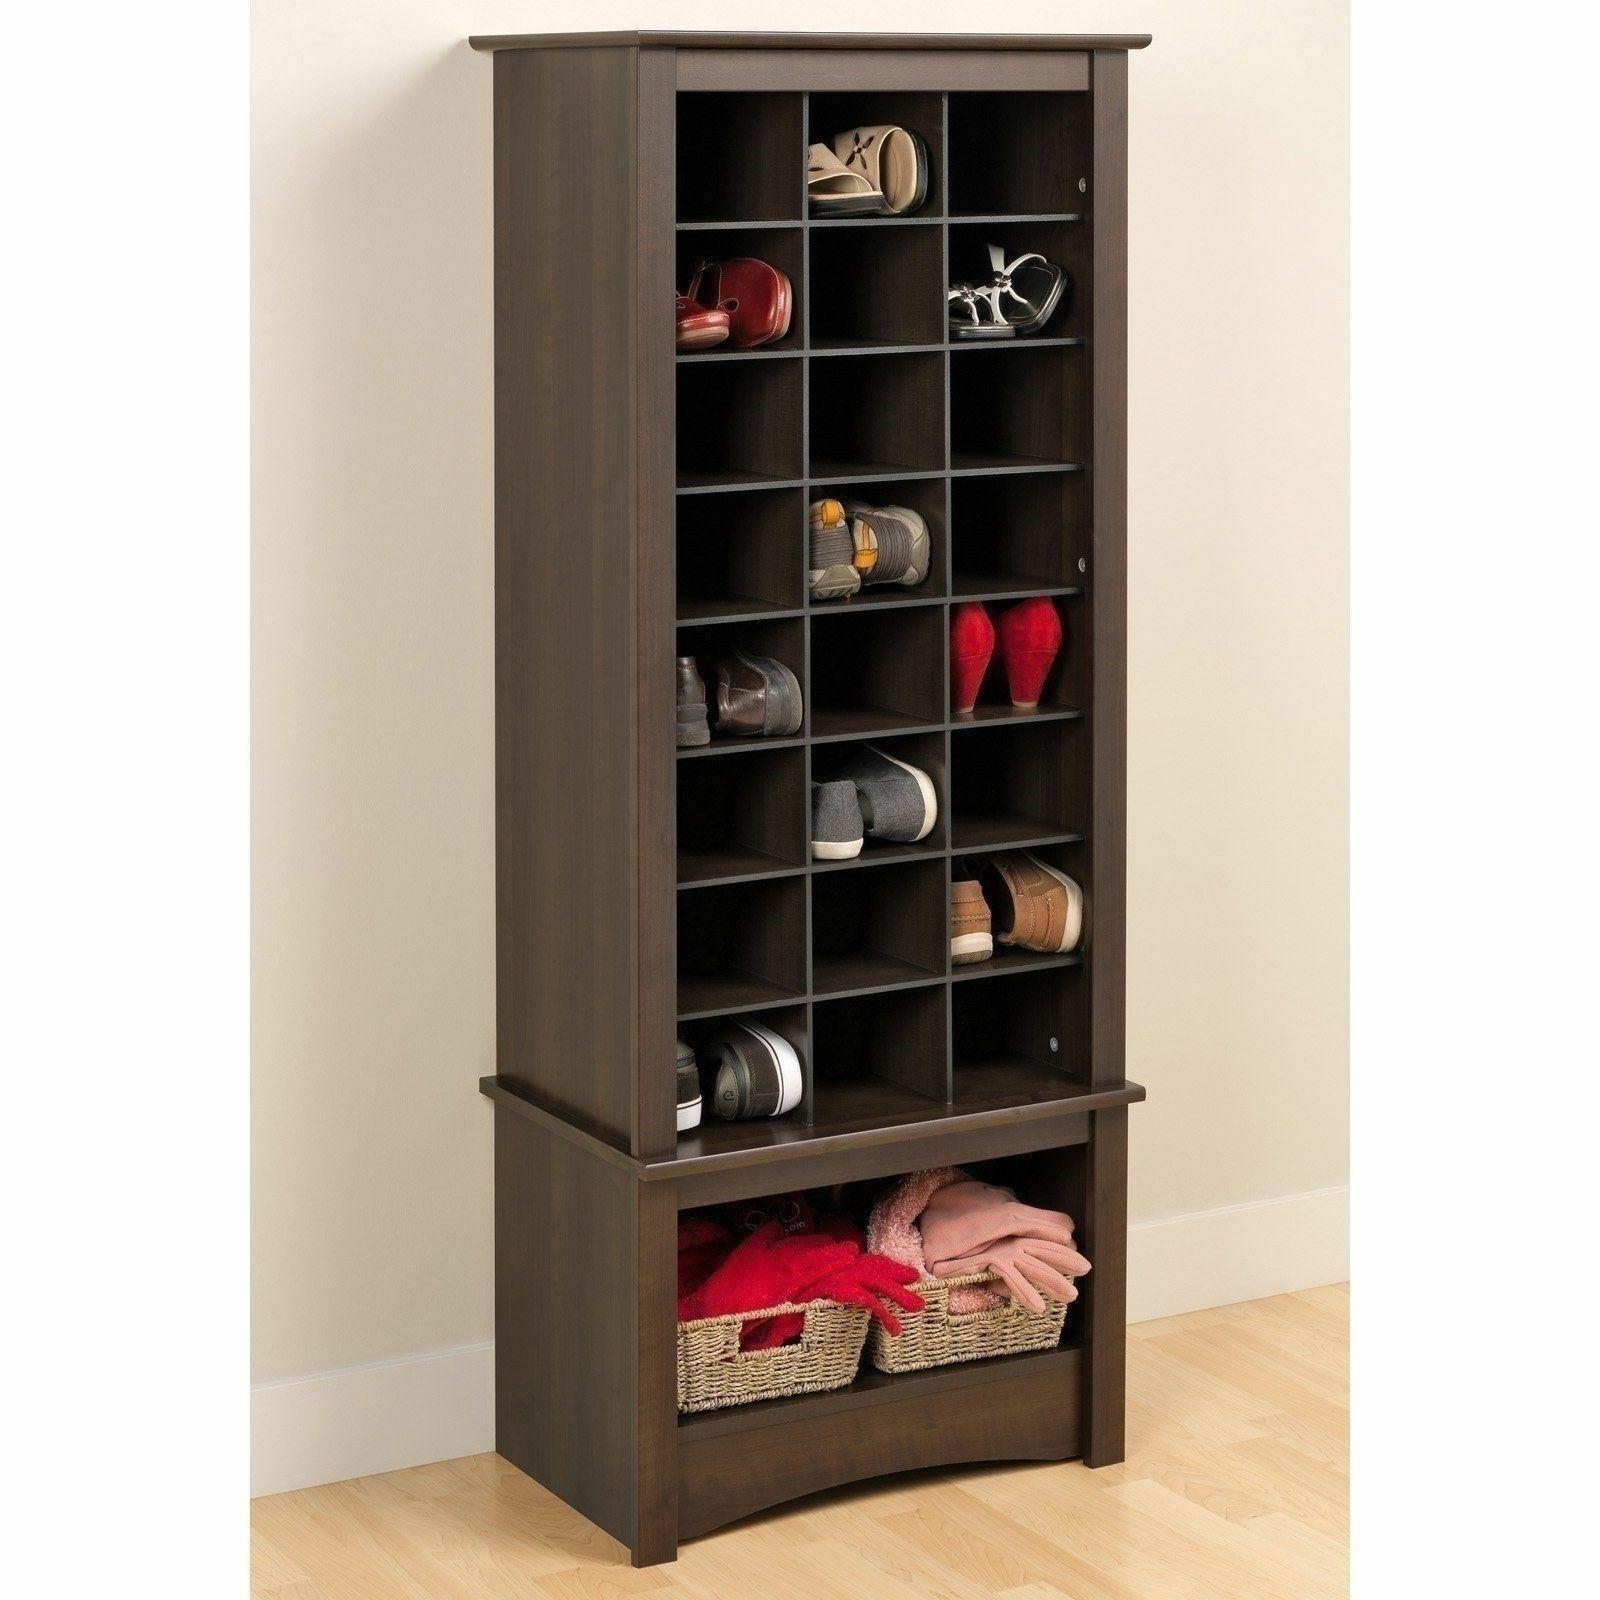 Espresso Finish Tall Shoe Cabinet Wooden Storage Cubbie